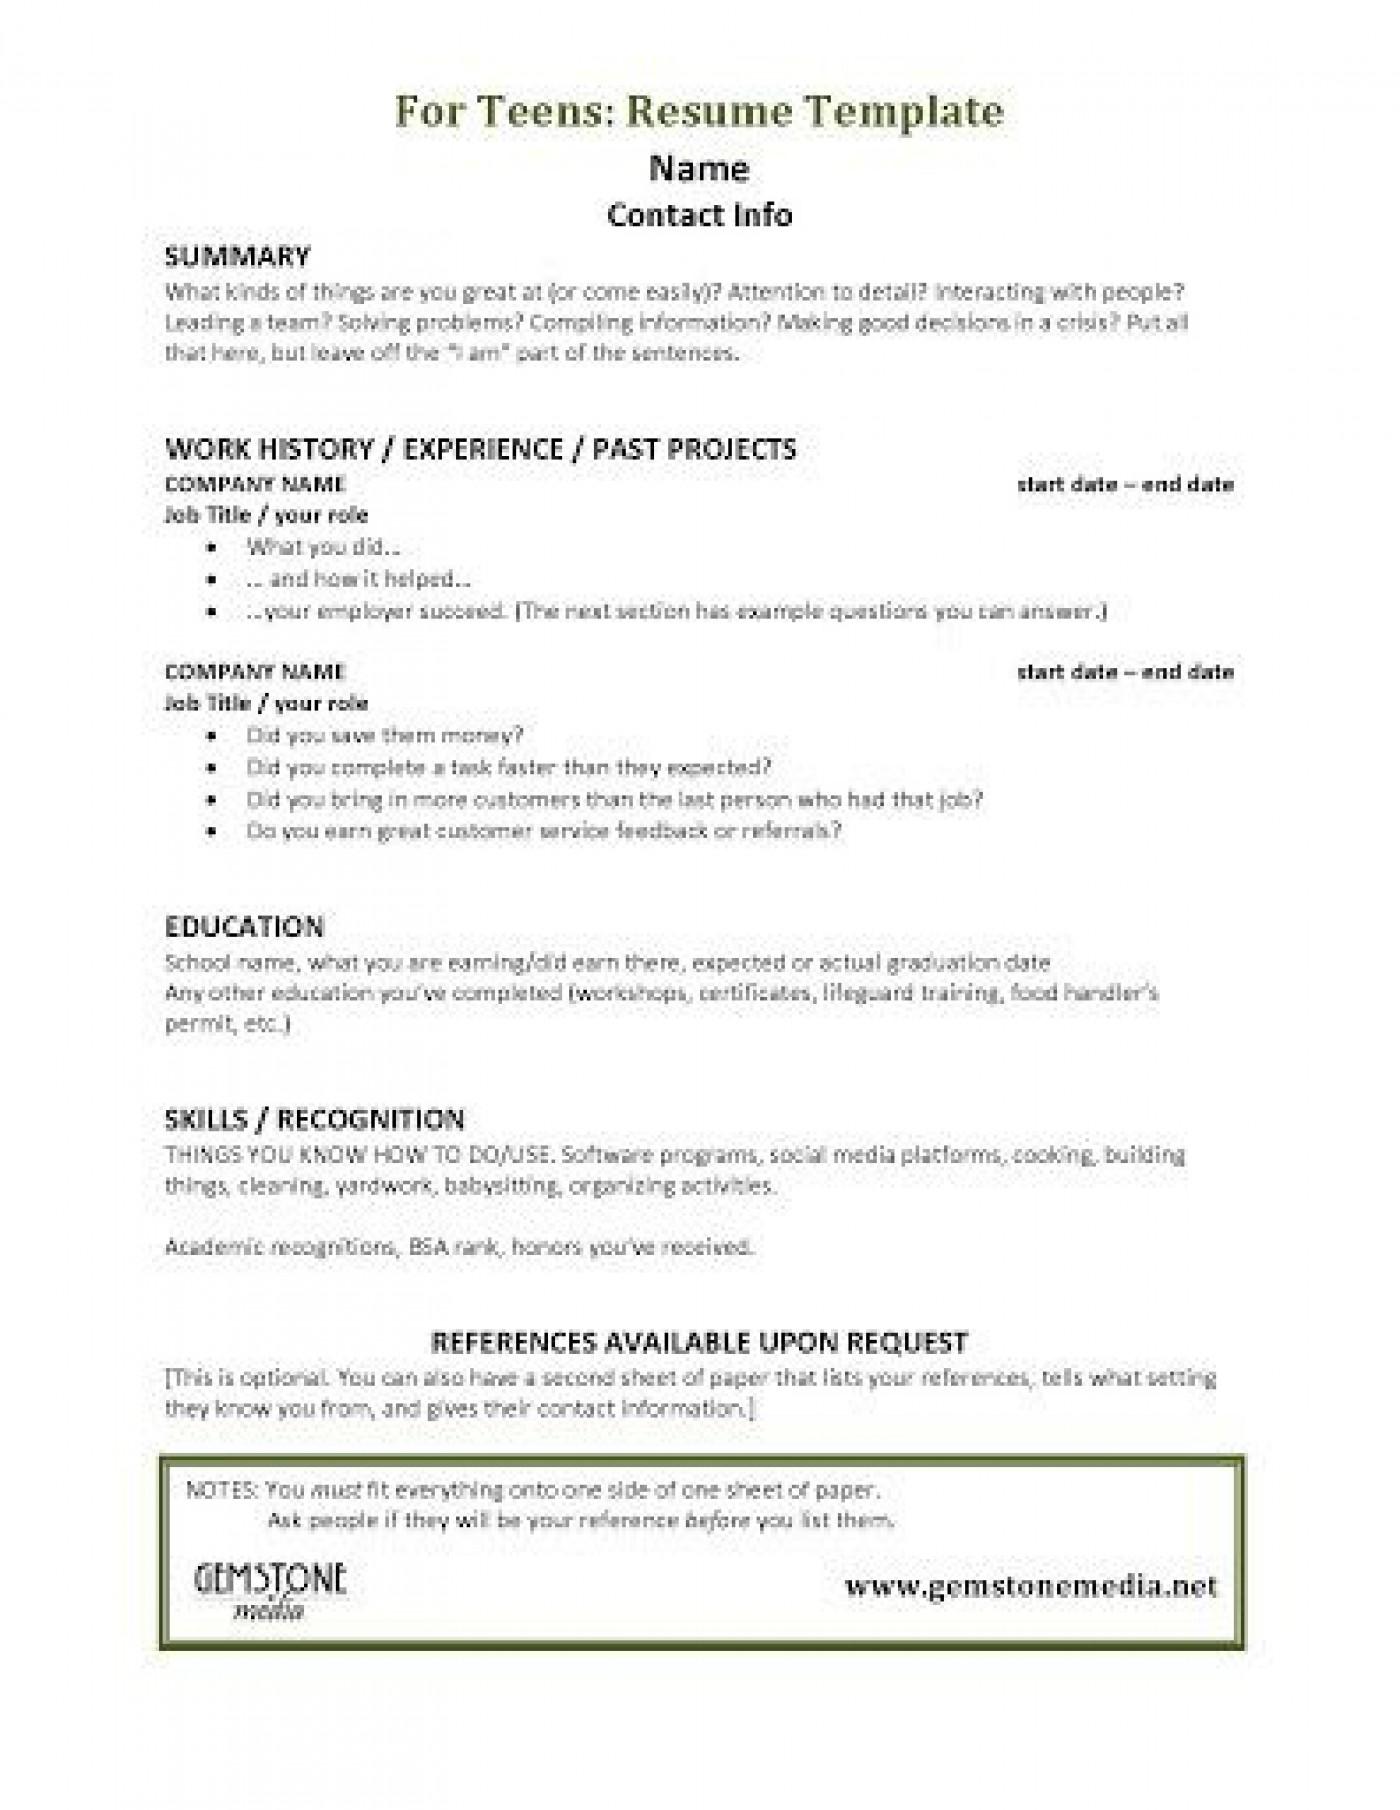 001 Astounding Resume Template For Teen Design  Teenager First Job Australia1400